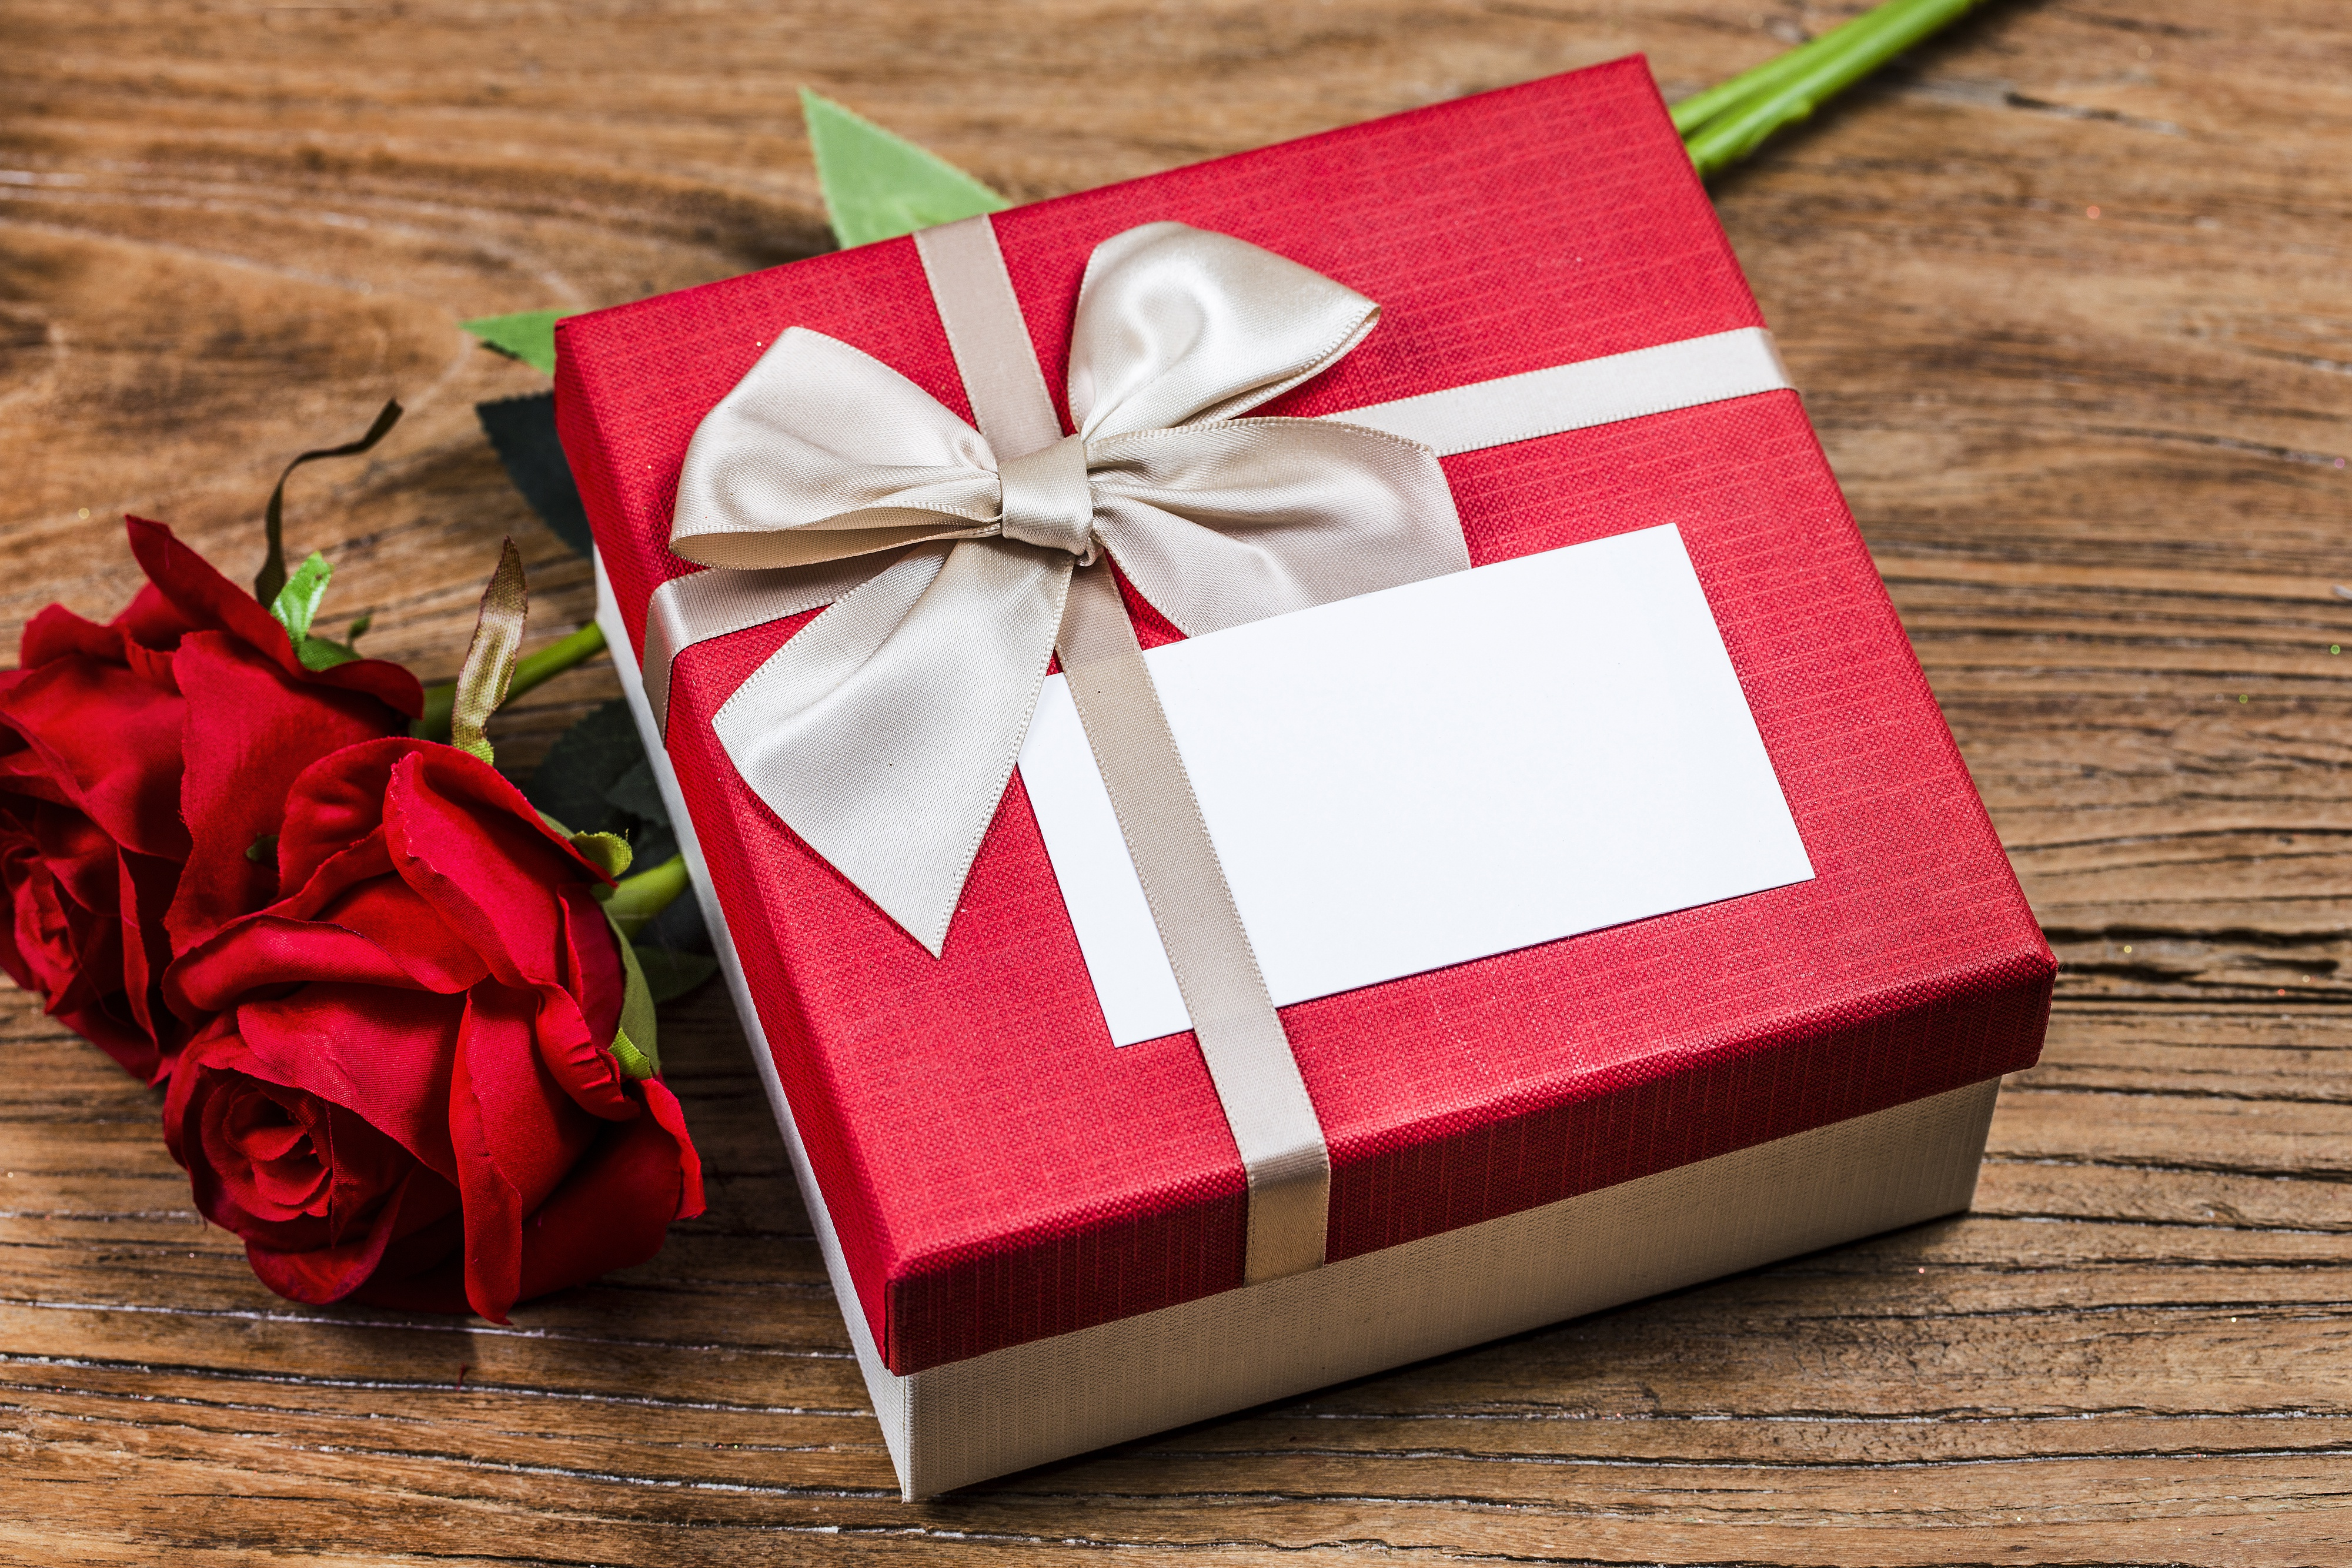 paperb valentine day gift - HD4000×2667